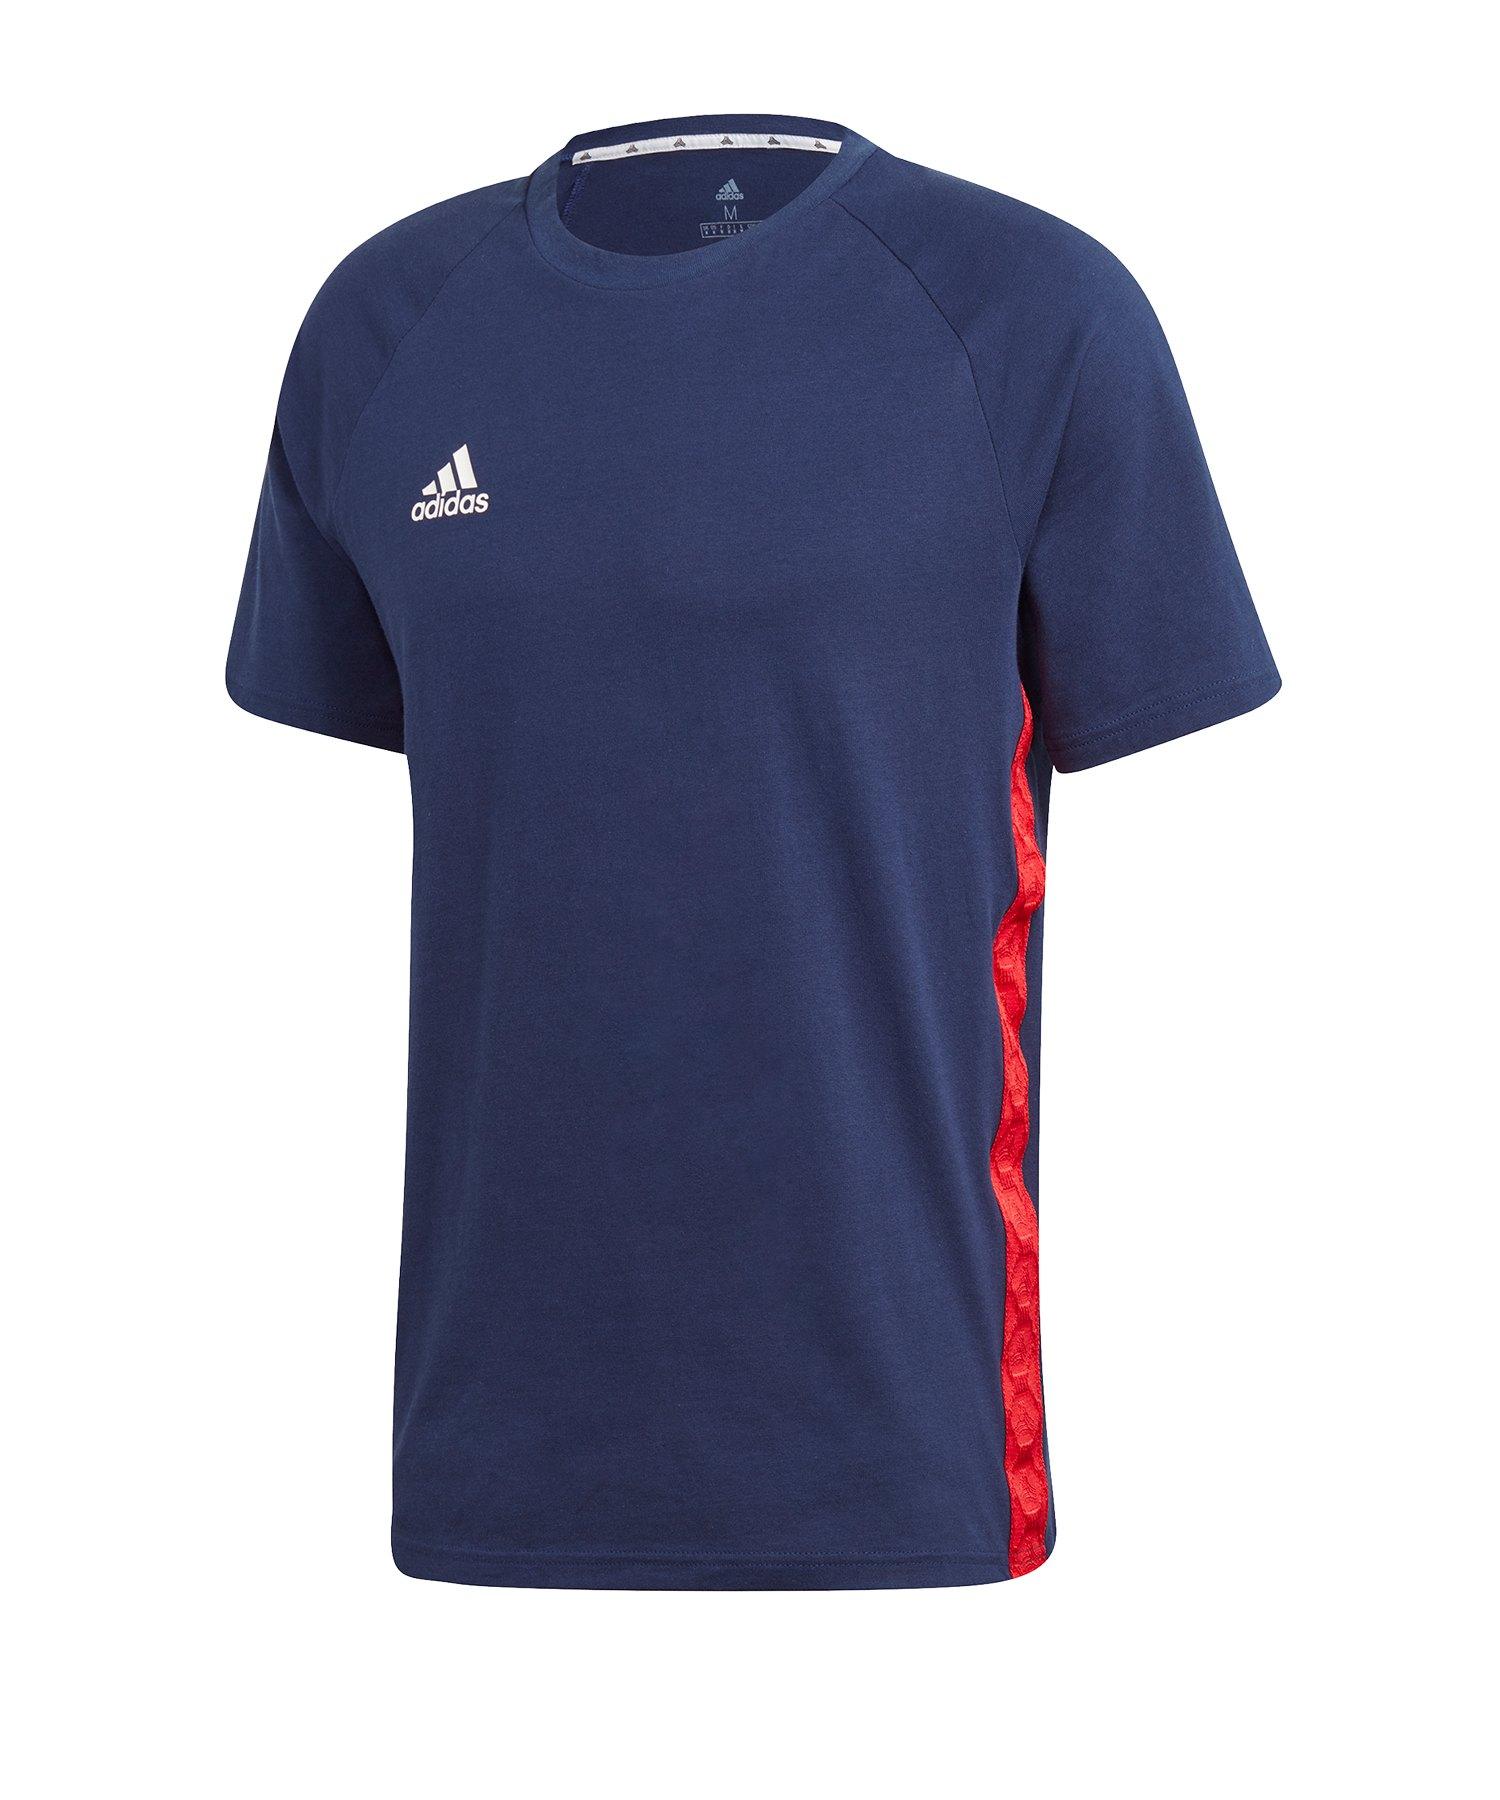 adidas Tan Tape T-Shirt Blau - blau